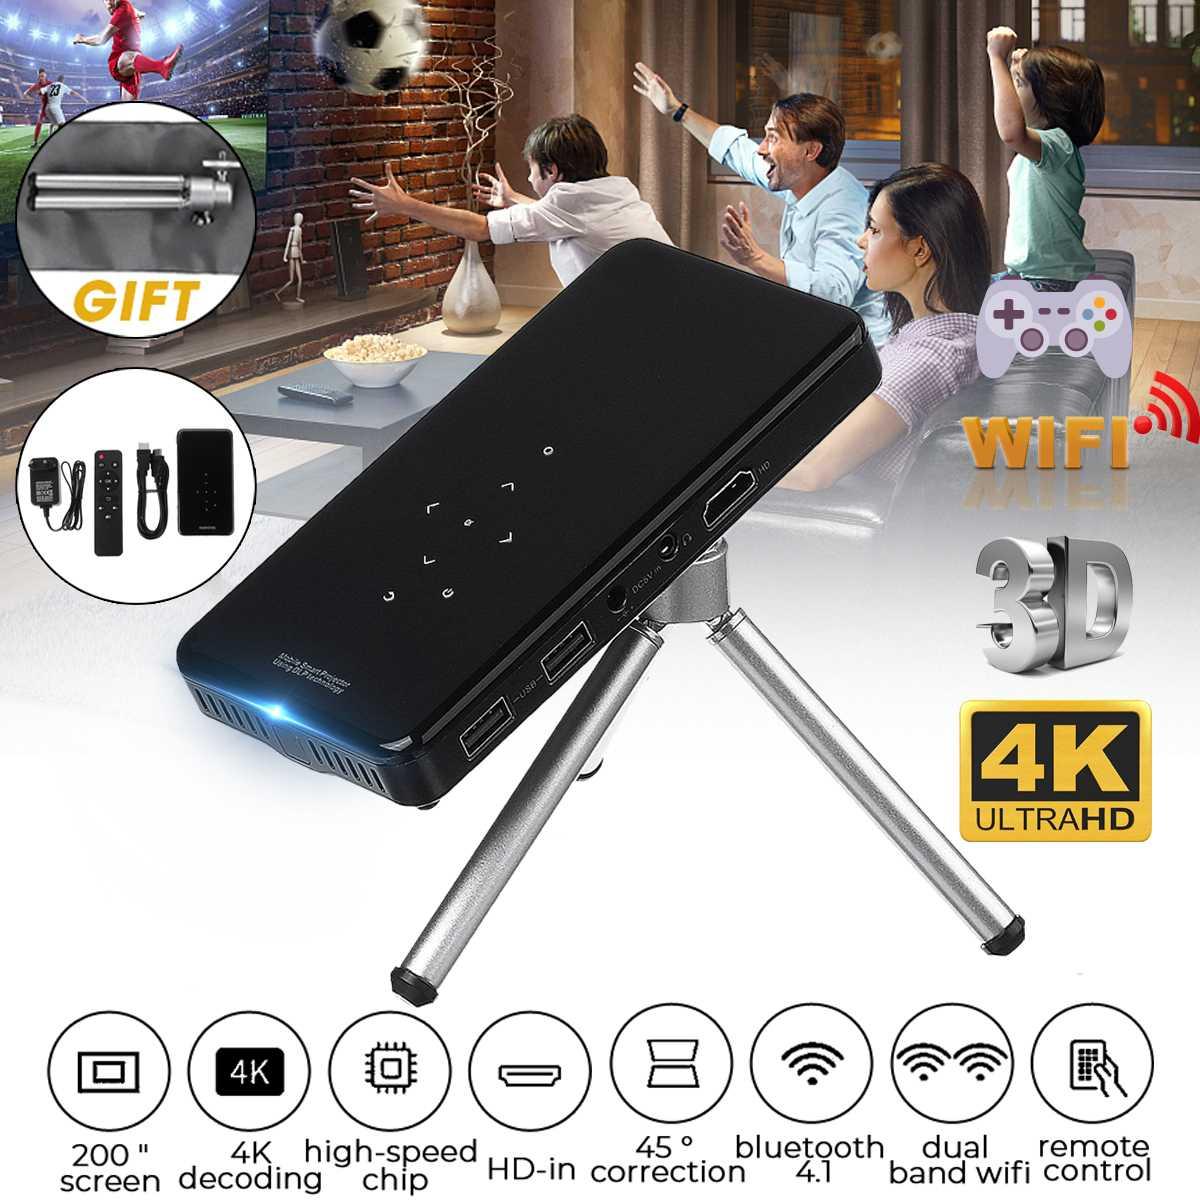 Mini proyector bluetooth 4,1 4K, proyector portátil de bolsillo Wifi inteligente, proyector móvil LED DLP para cine en 3D de Smartphone